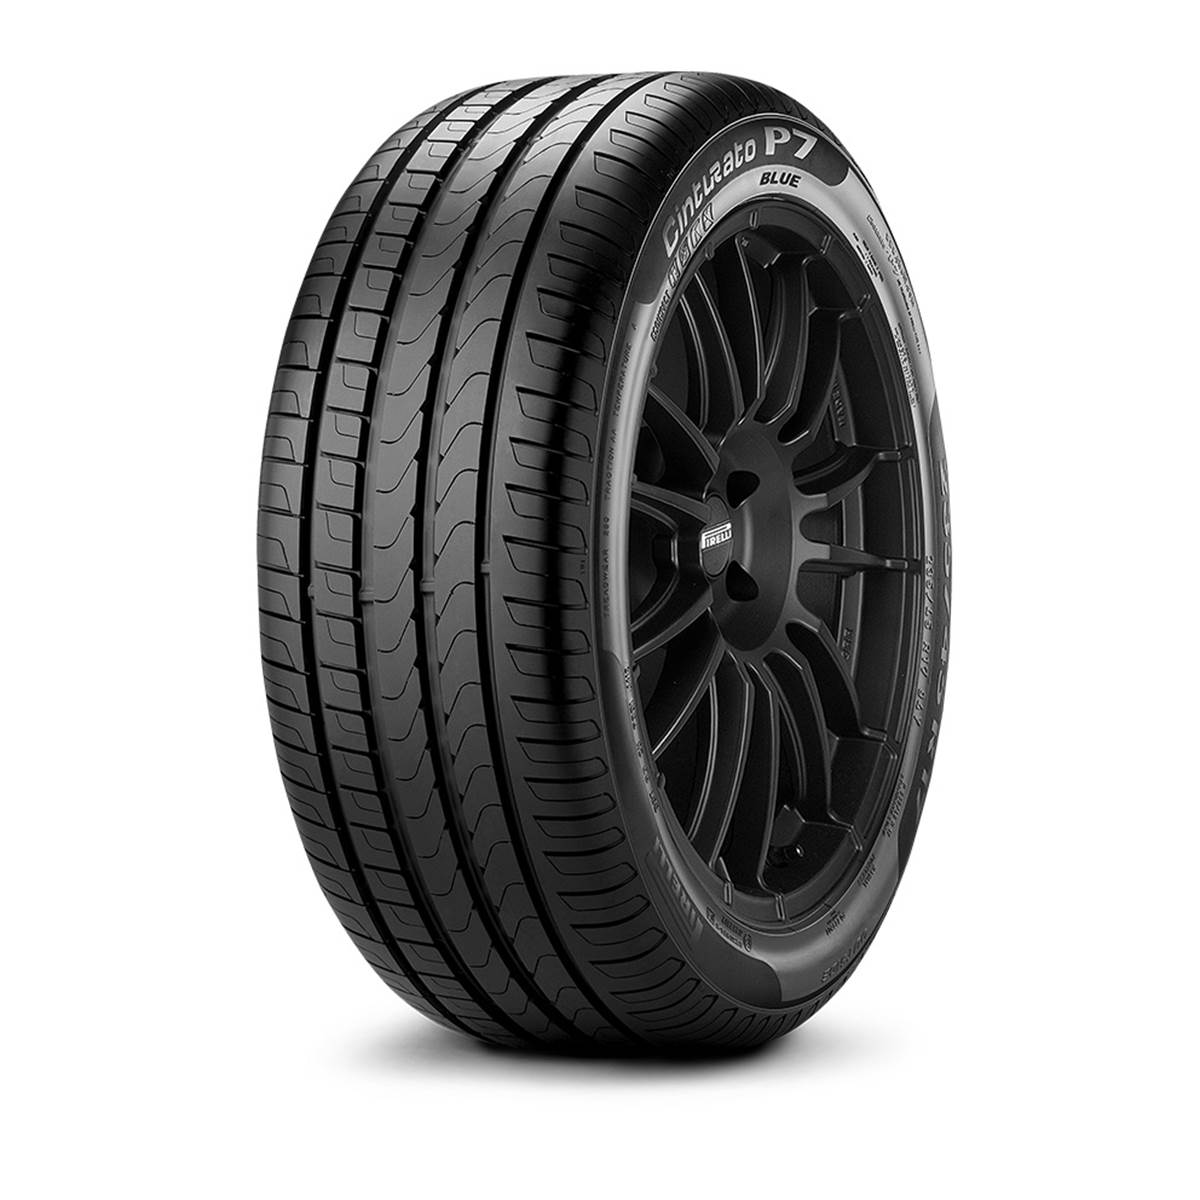 Pneu Pirelli 235/45R17 97W Cinturato P7 Blue XL